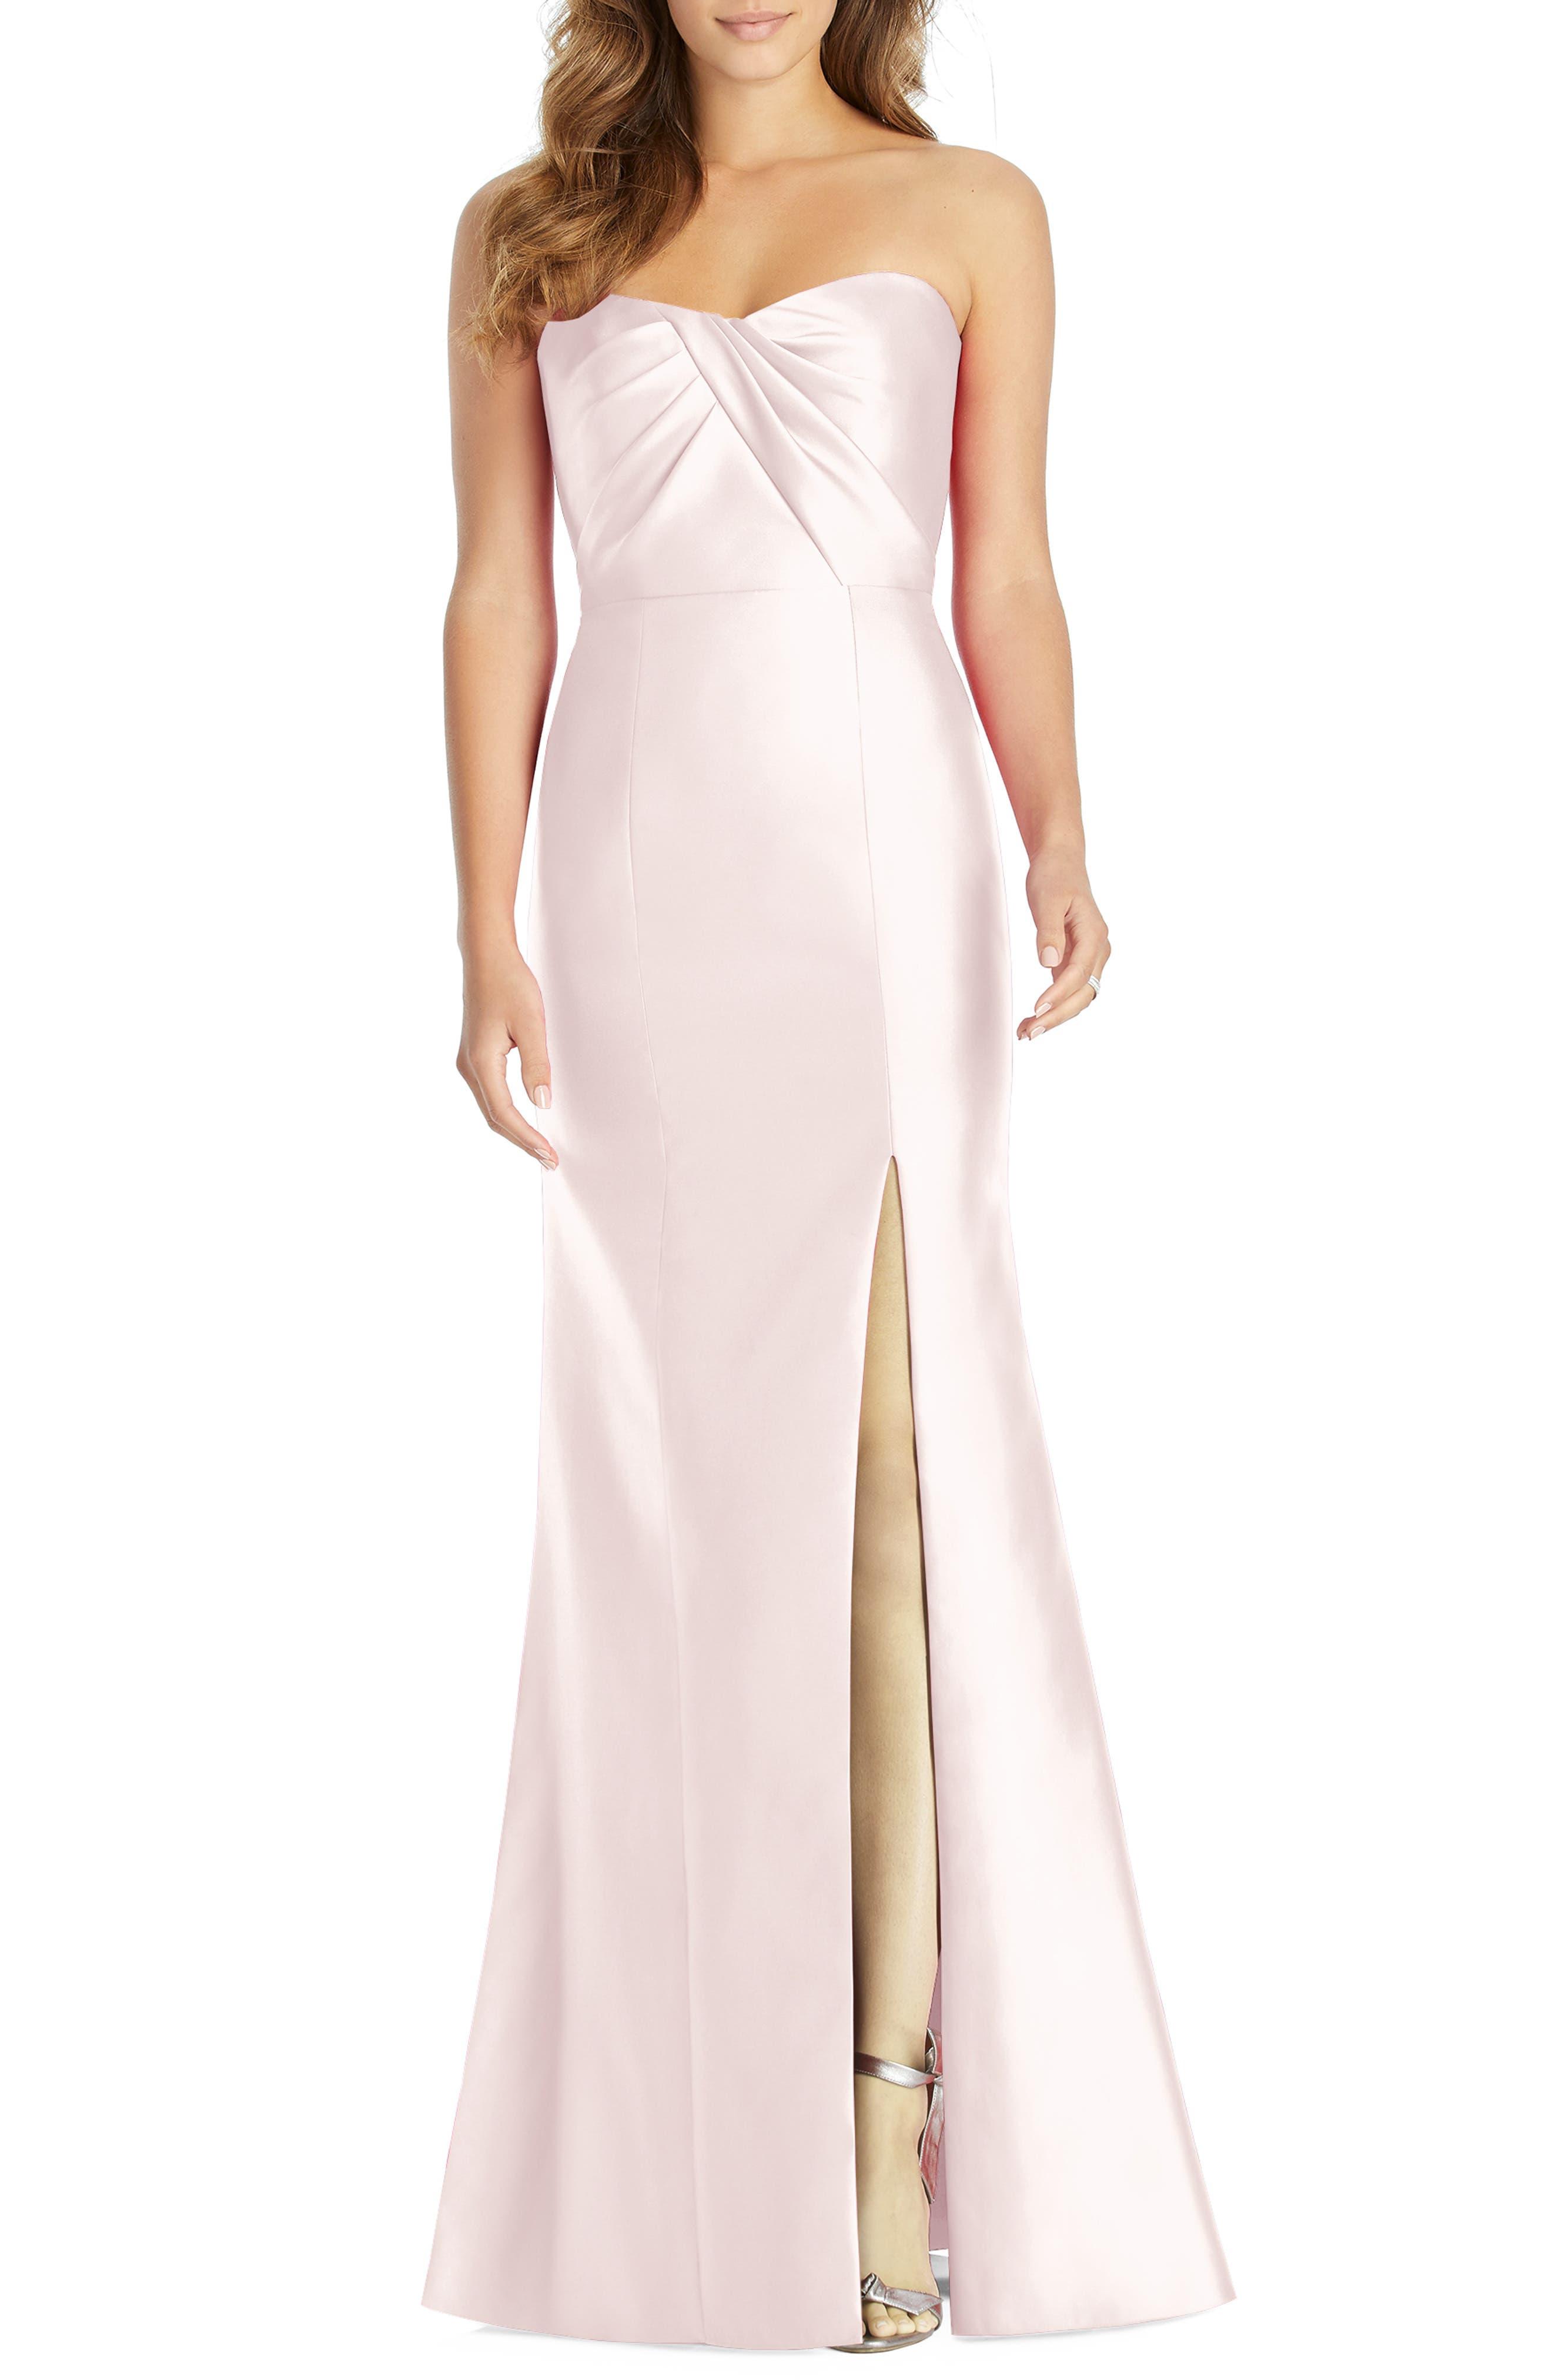 Sateen Twill Strapless Sweetheart Neckline Gown